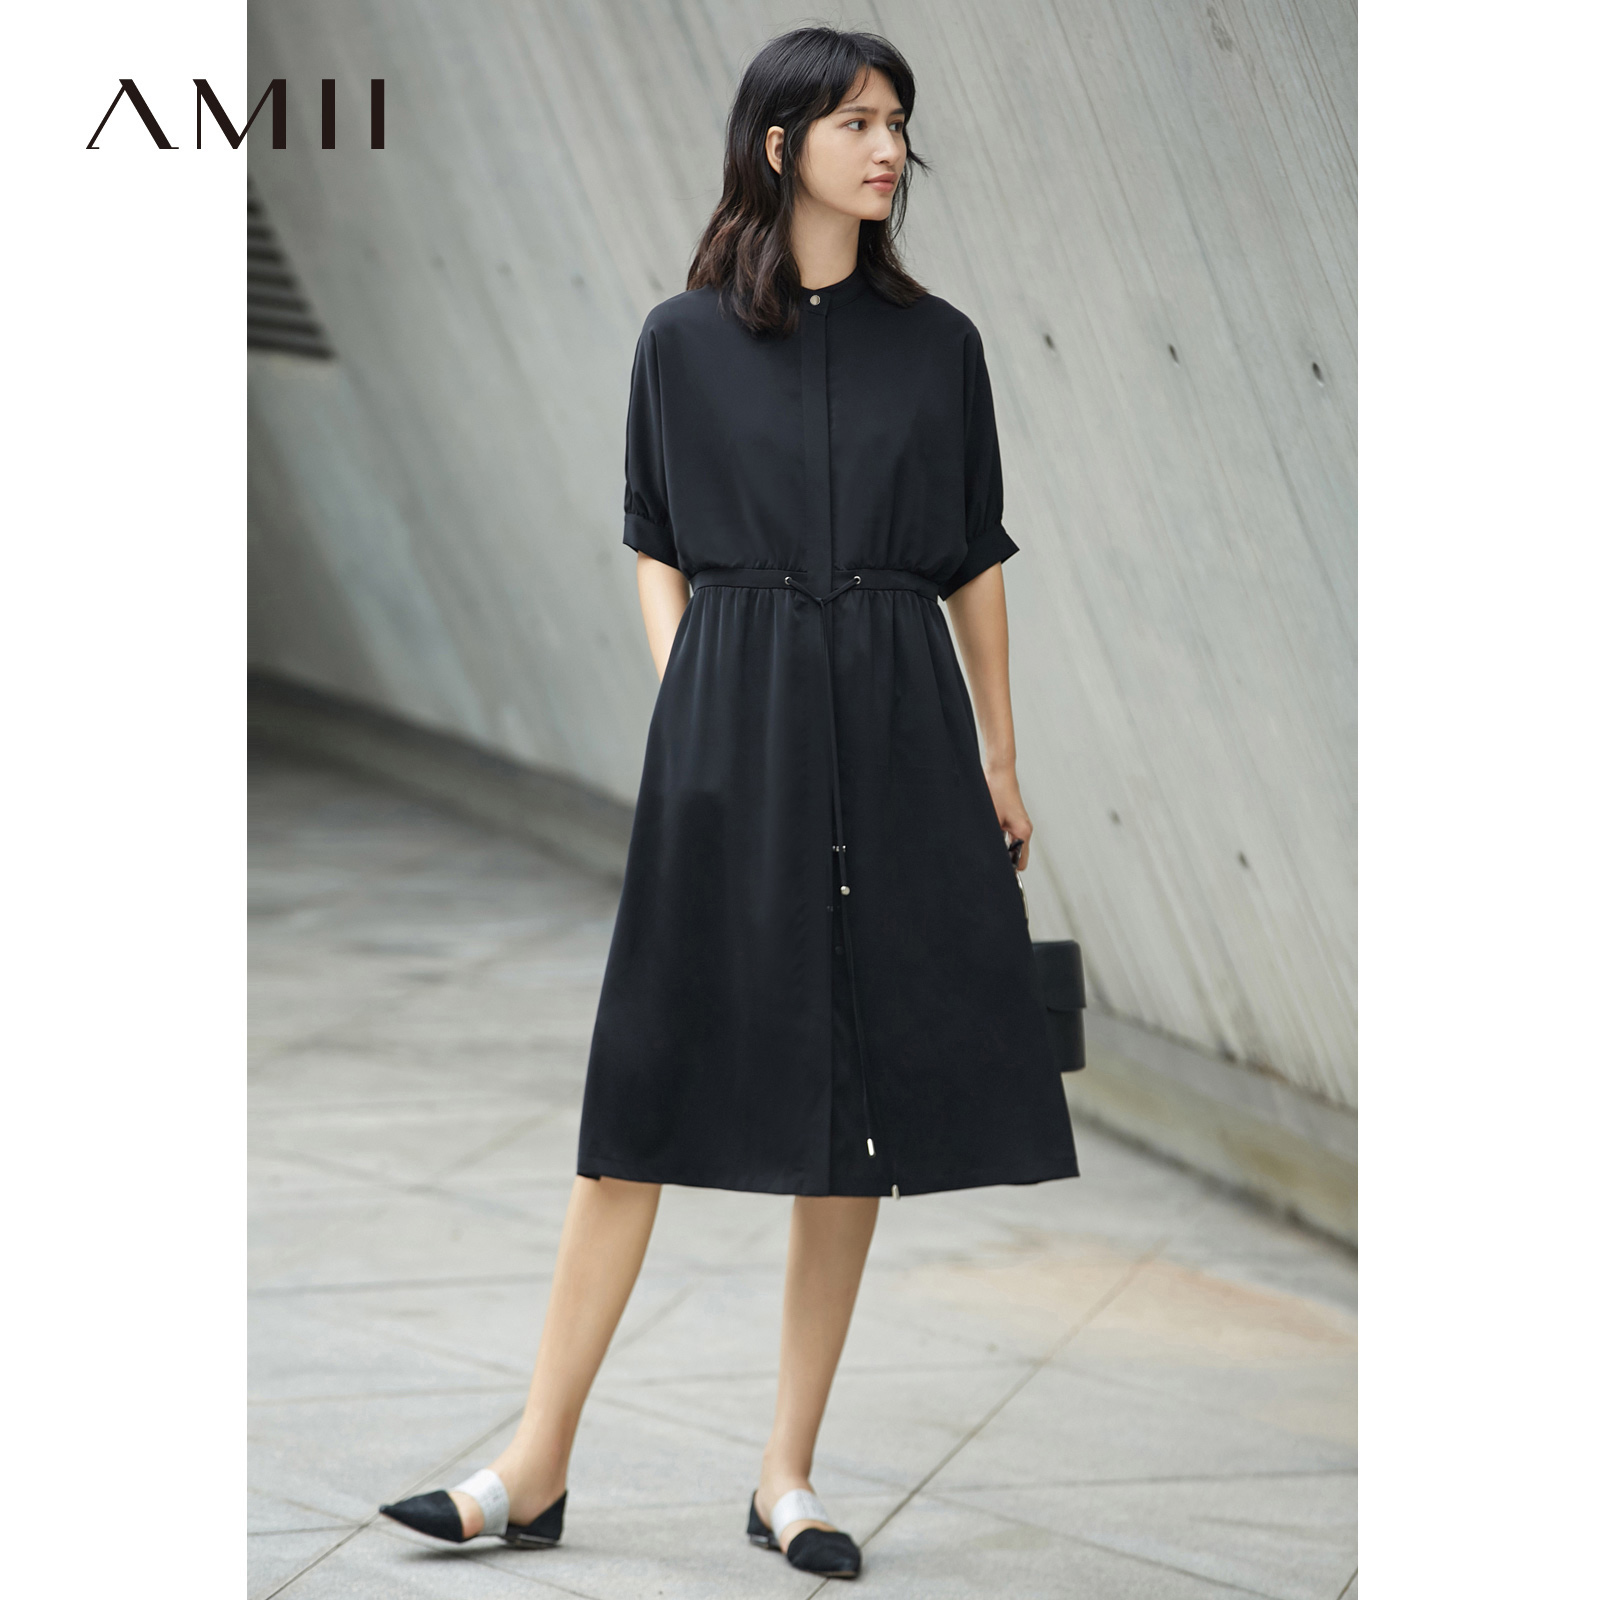 Amii Casual Women Dress 2018 Summer Loose Batwing Sleeve Waist Straps Chiffon Mid Calf Dresses